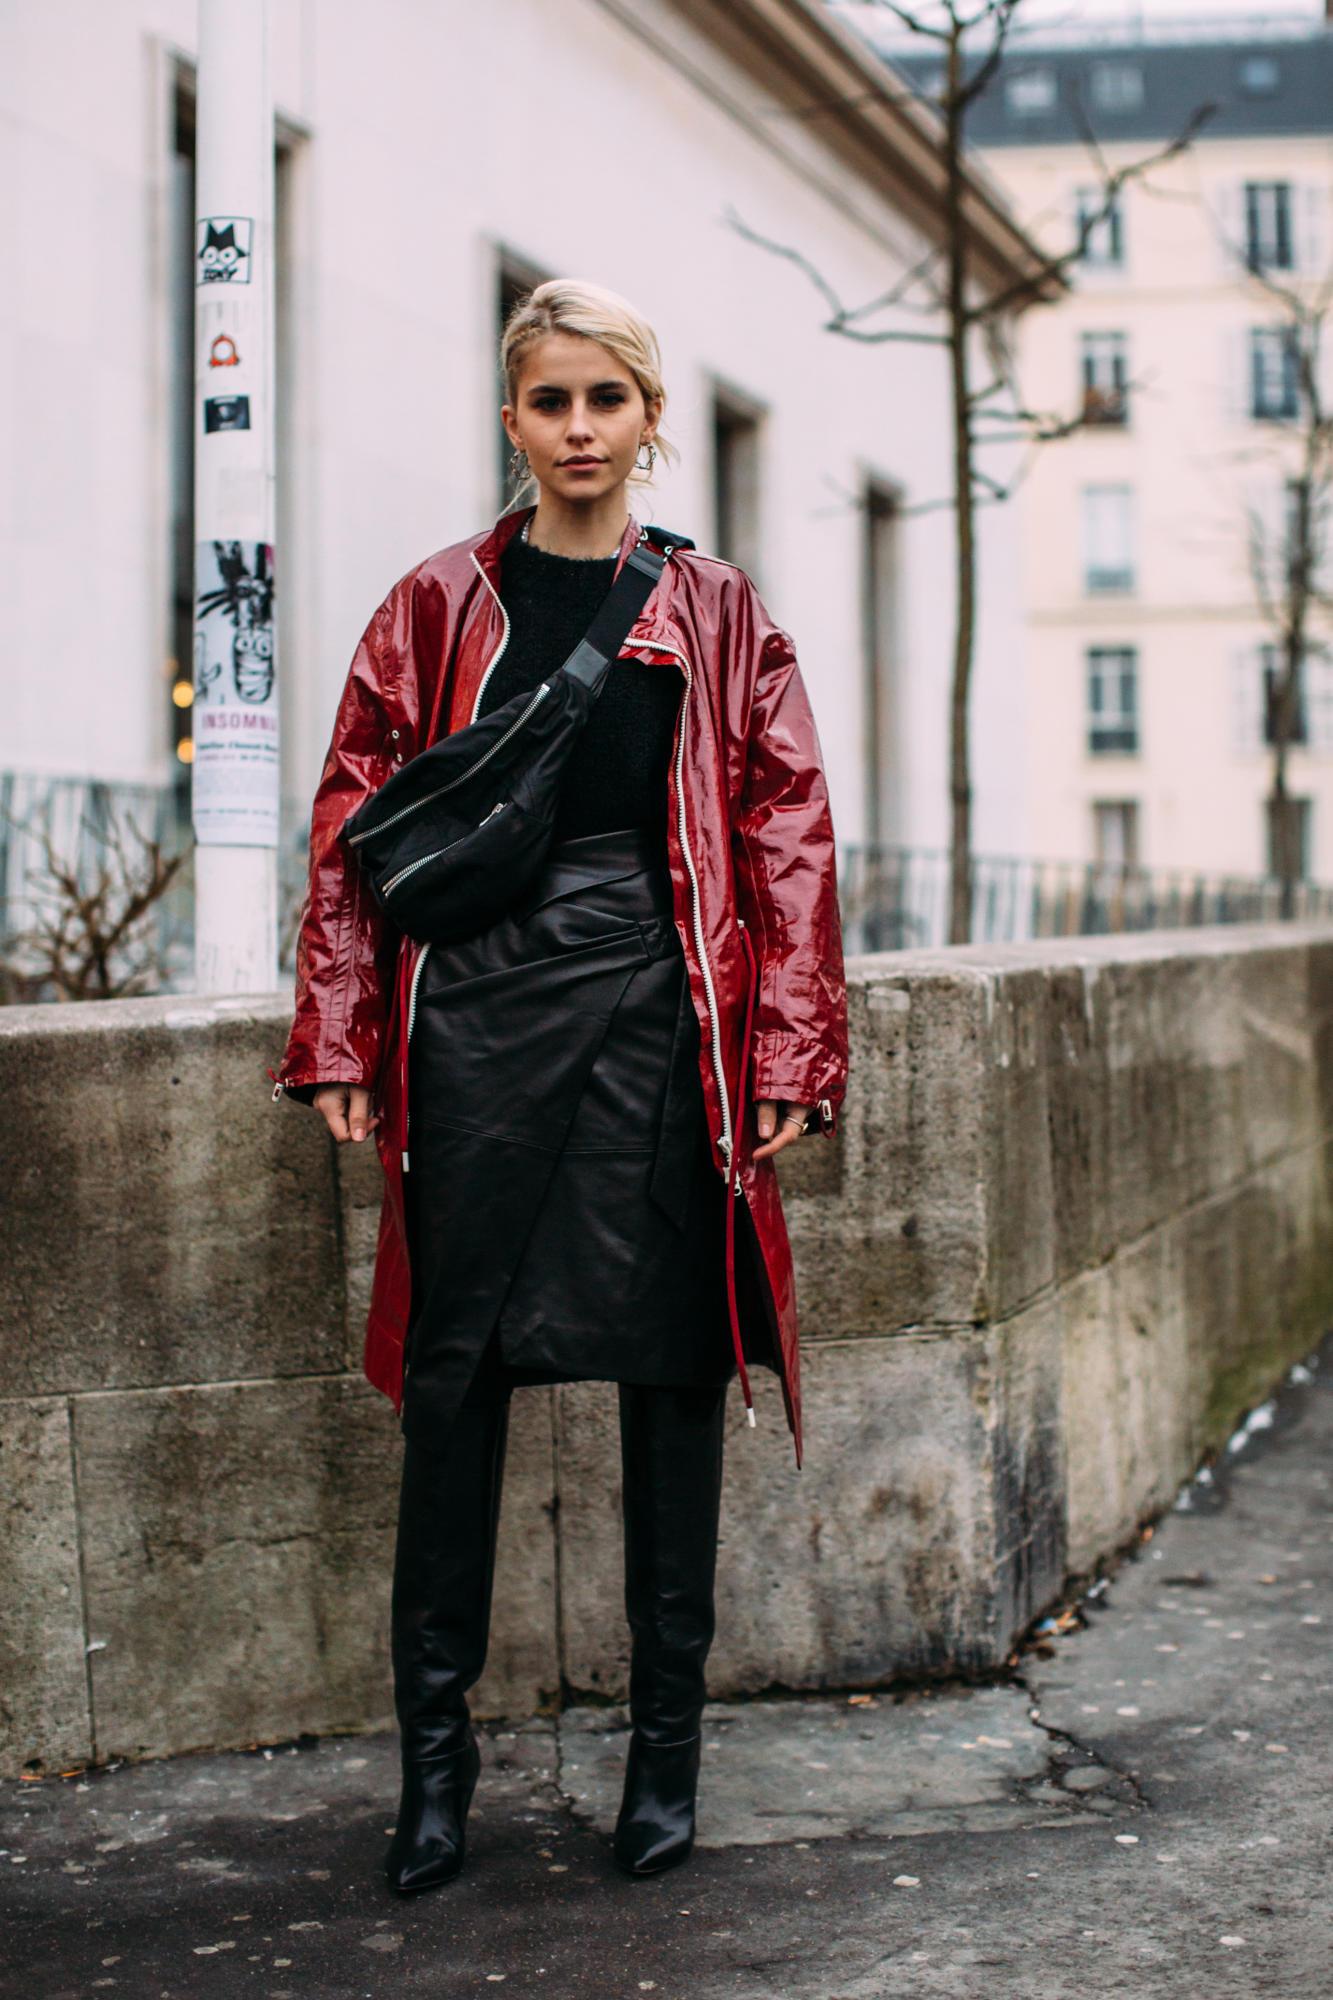 paris-fashion-week-street-style-fall-2018-day-3-74.jpg